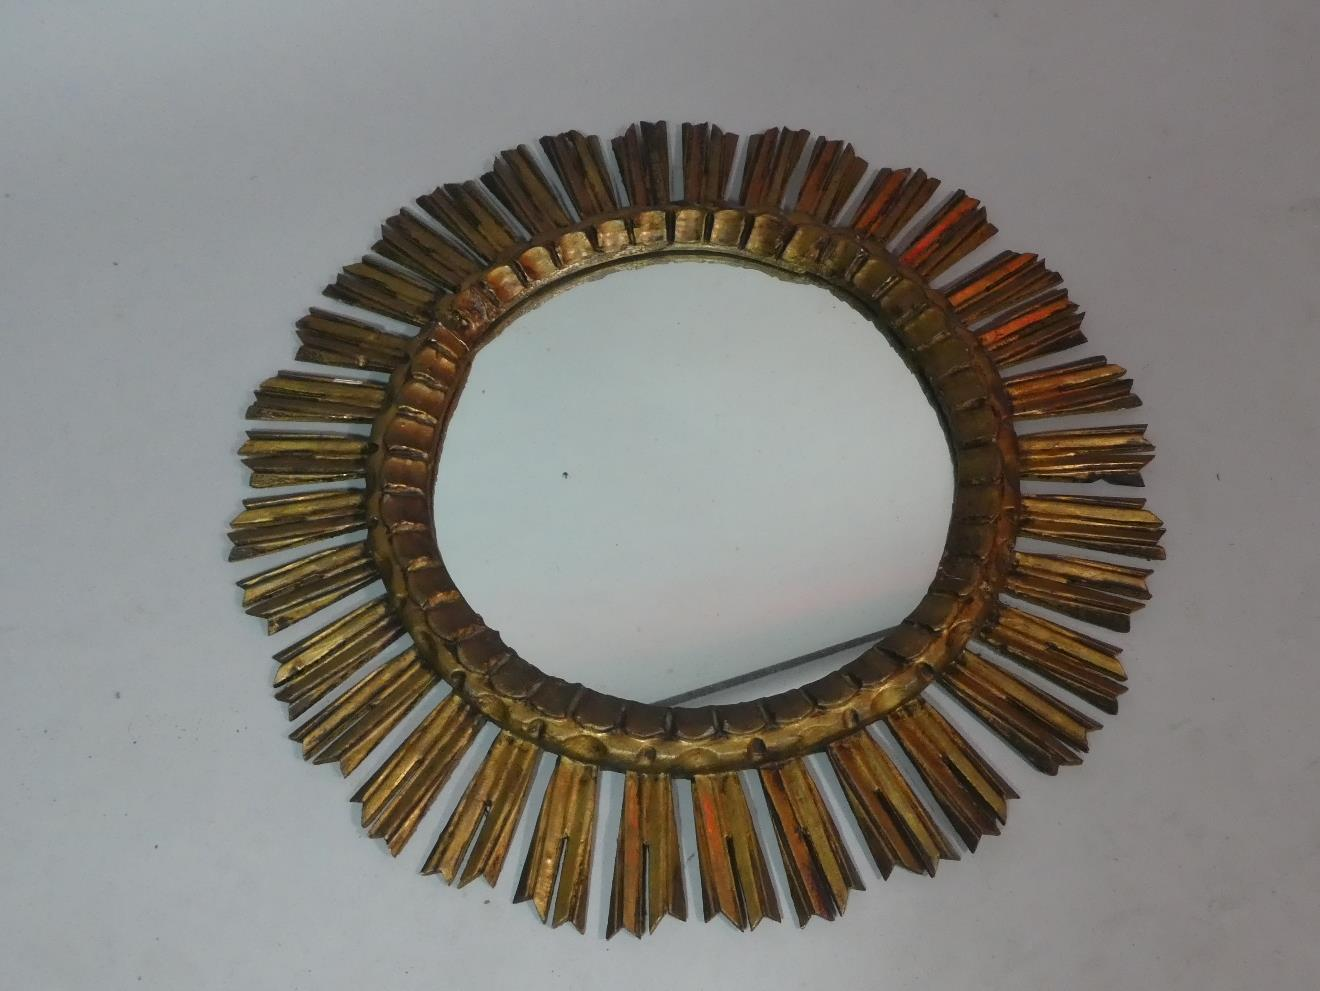 Lot 448 - A Reproduction Gilt Wood Starburst Mirror, 62cm Diameter